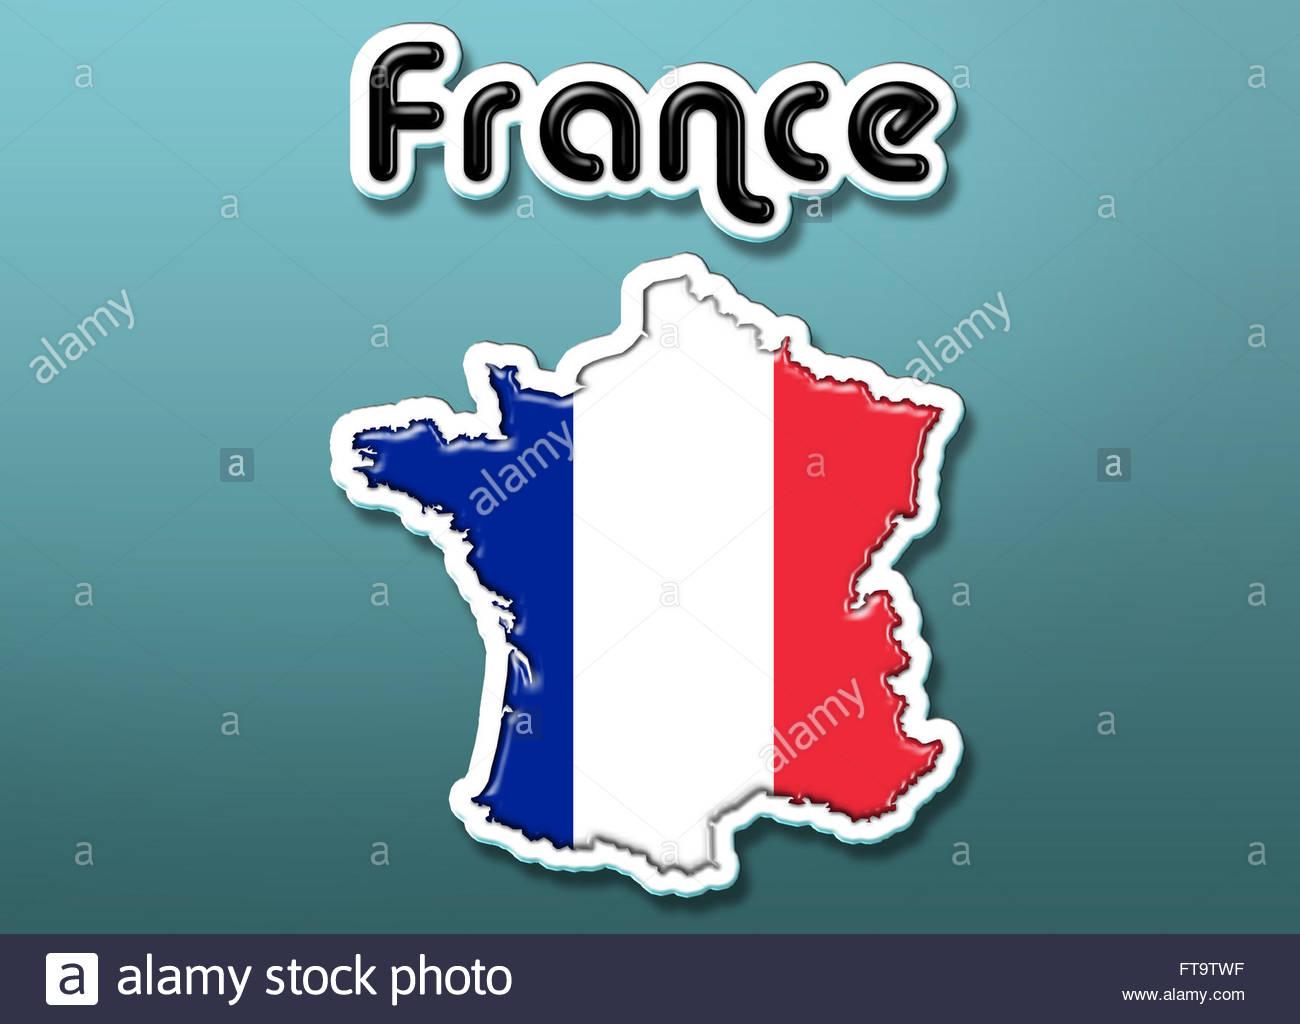 Map of France illustration - Stock Image